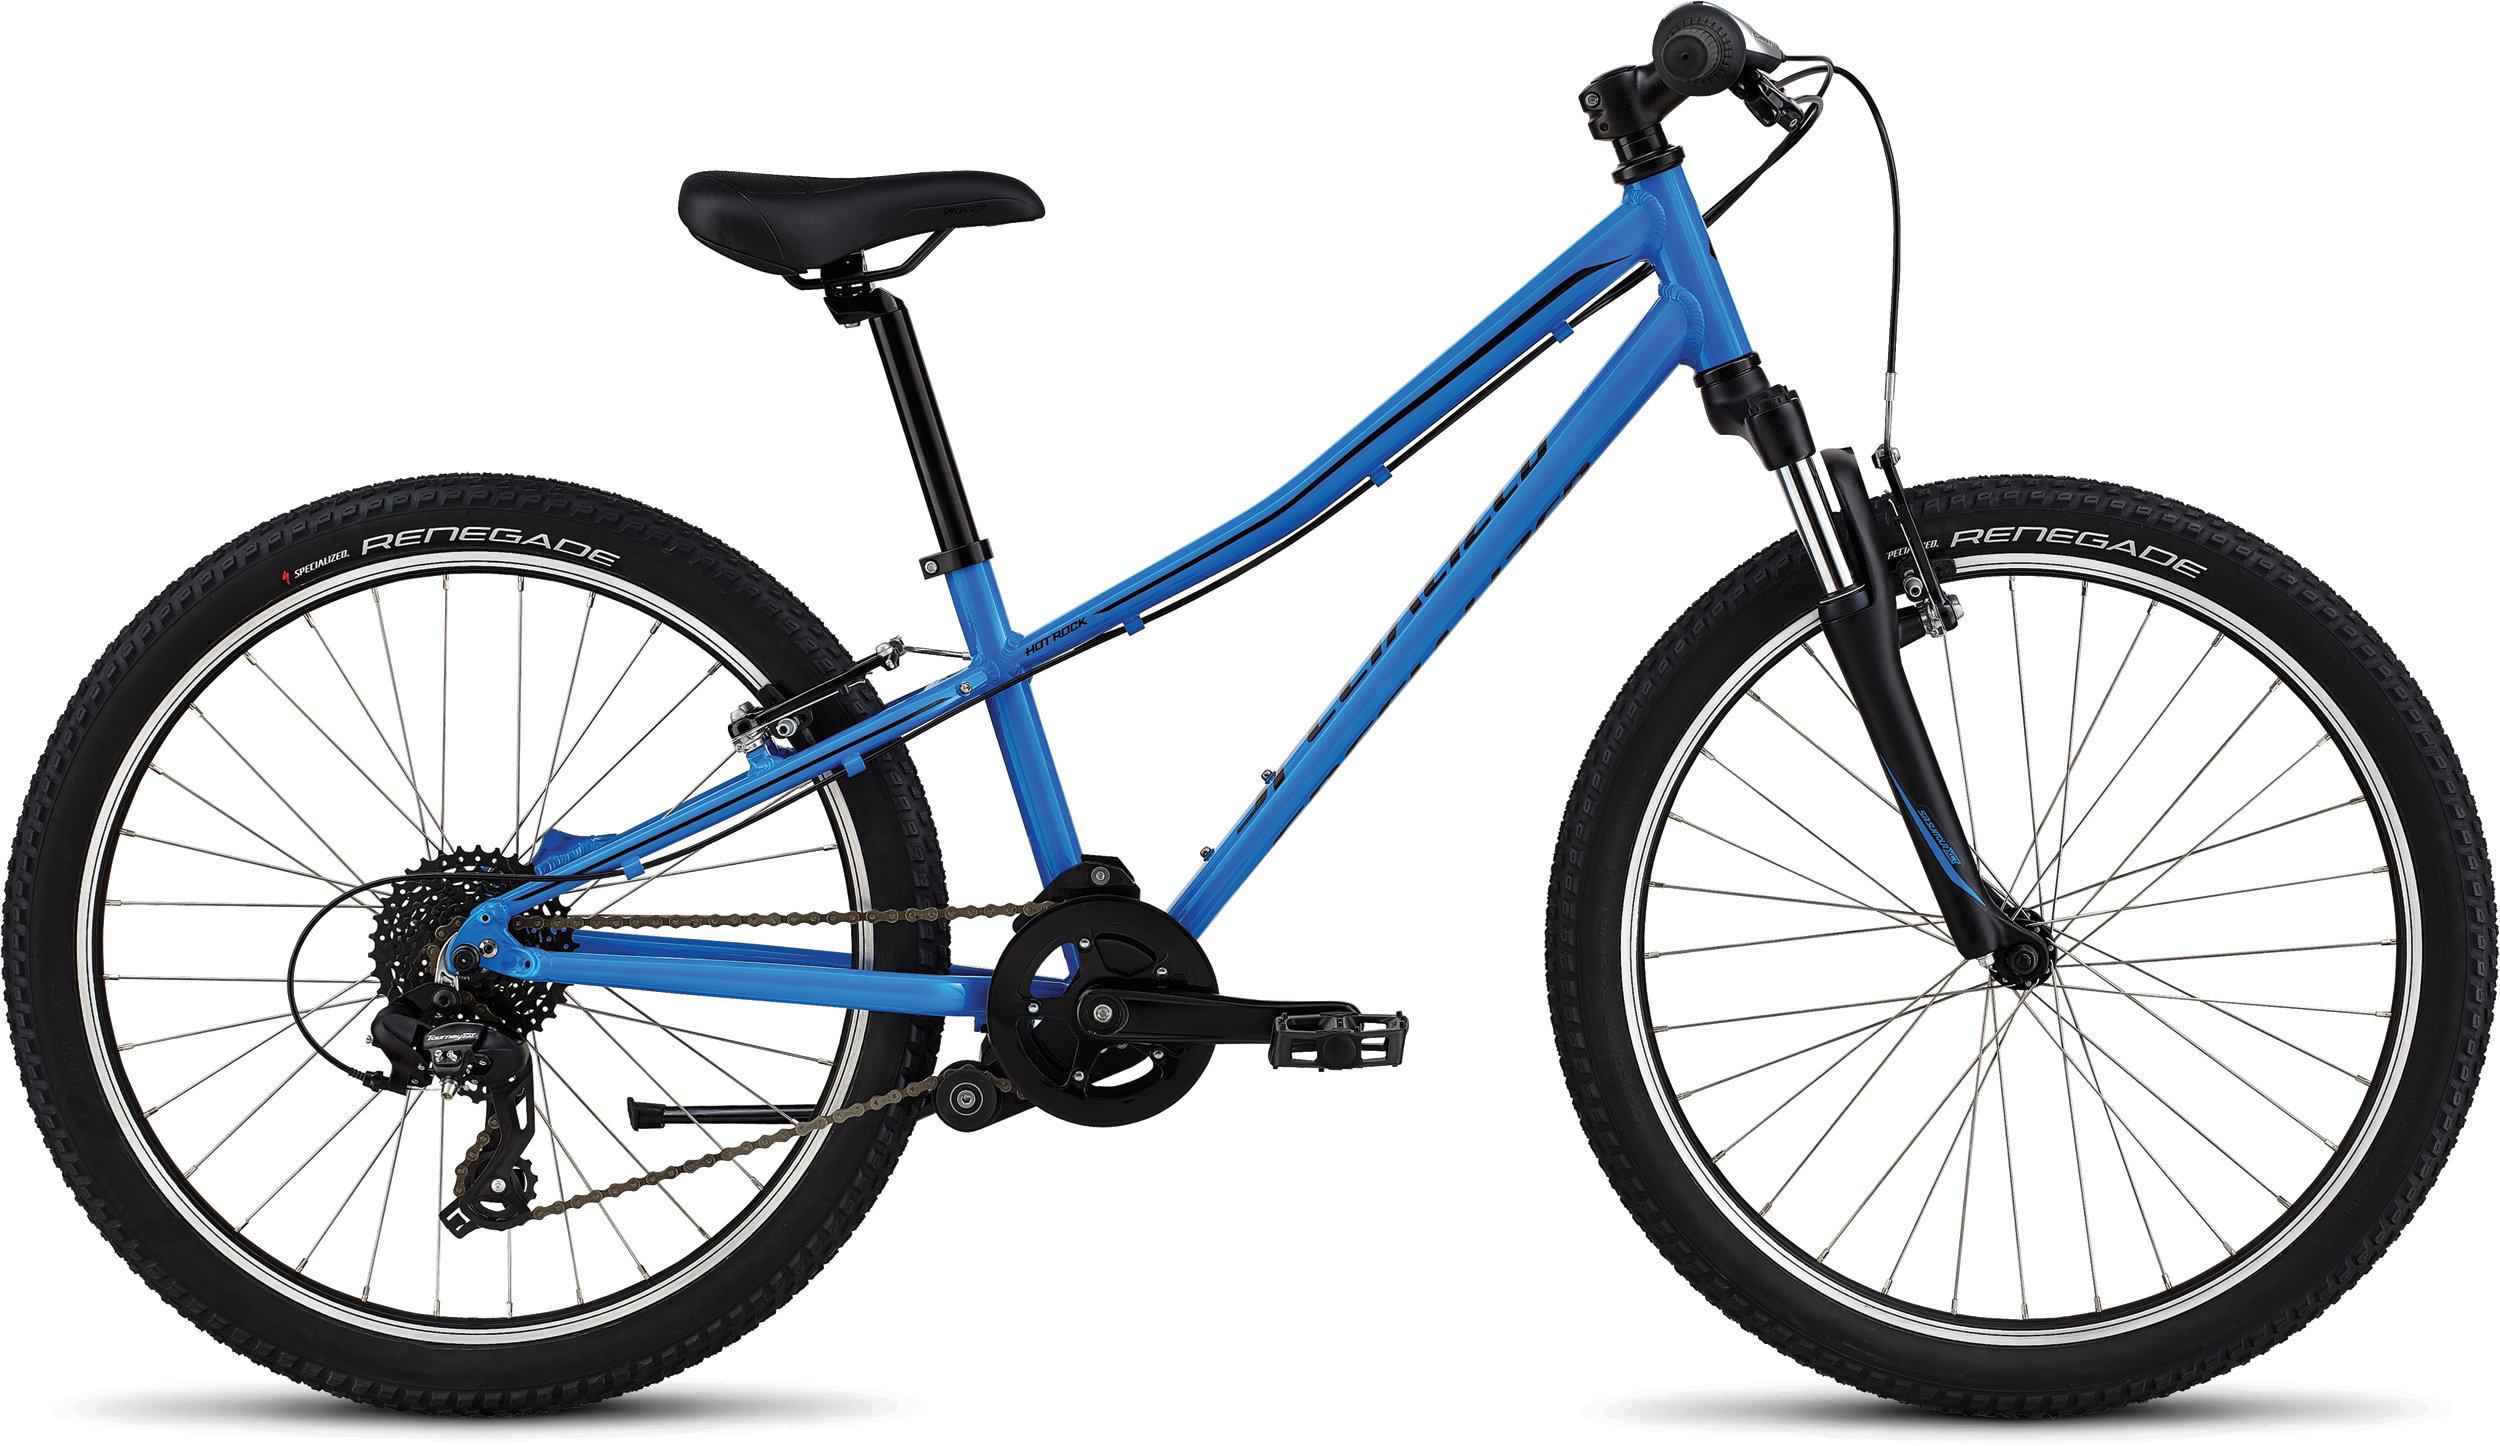 Specialized Hotrock 24 Neon Blue/Black 11 - Alpha Bikes